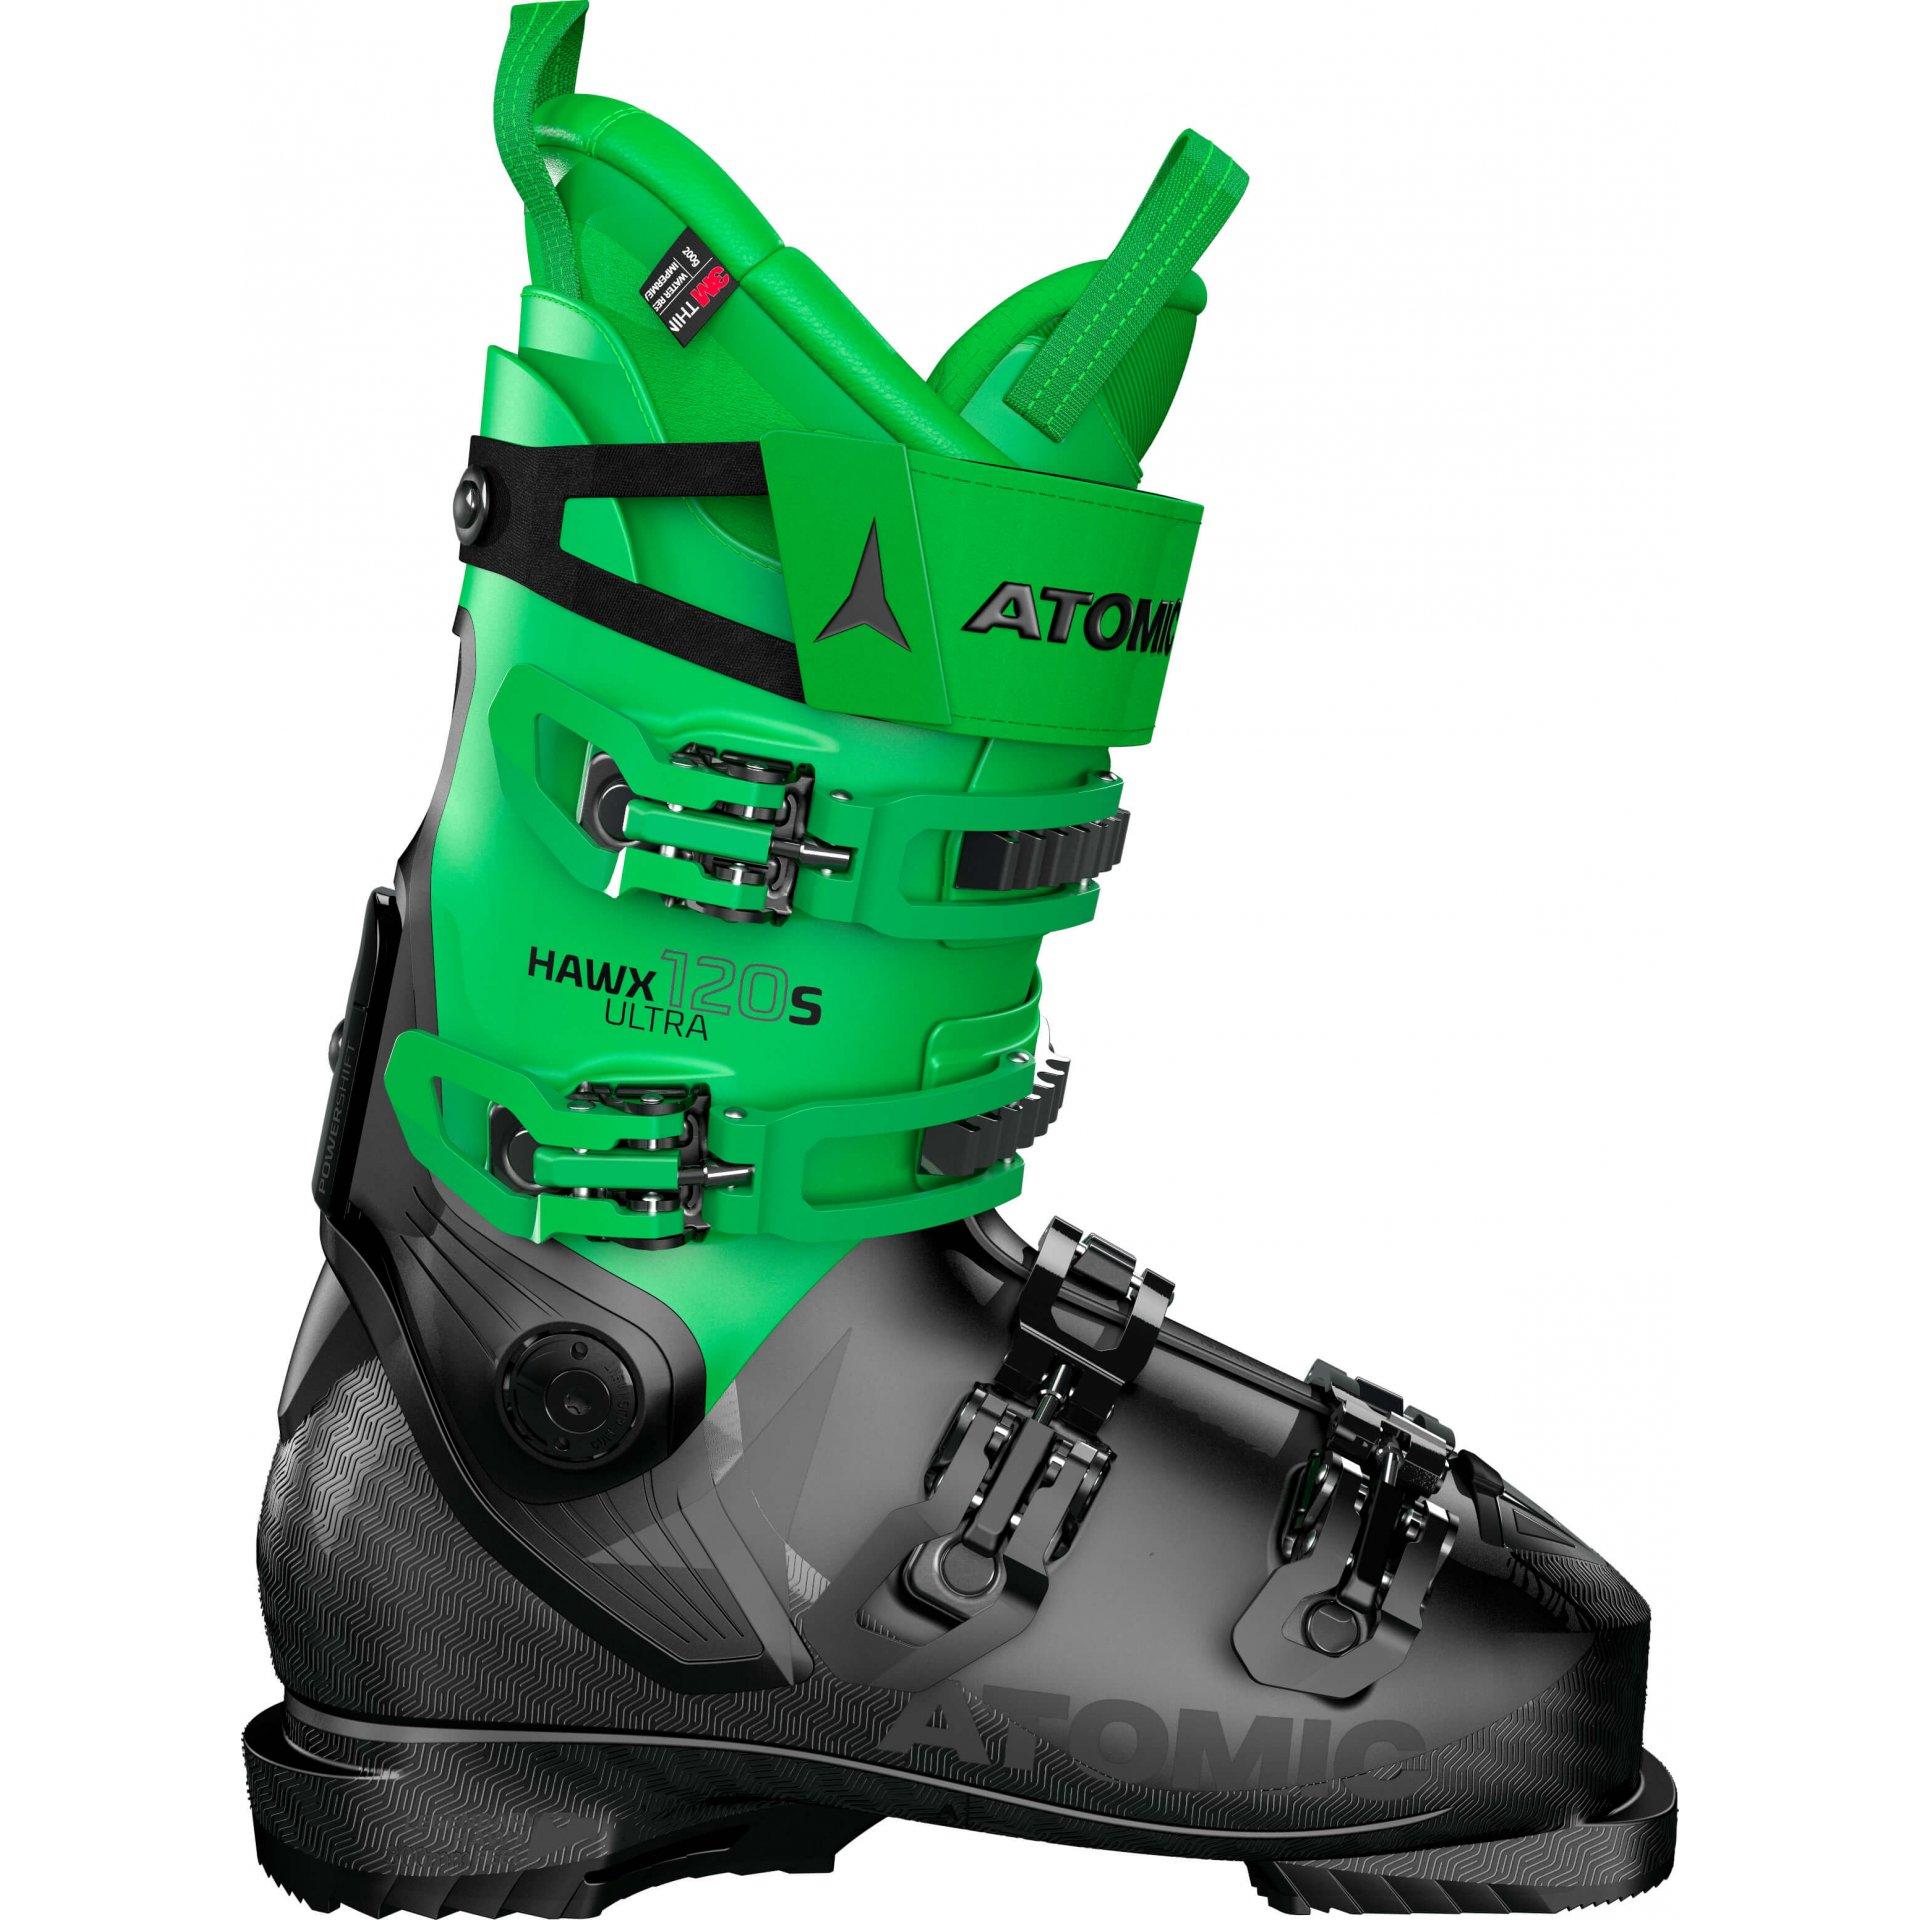 BUTY NARCIARSKIE ATOMIC HAWX ULTRA 120 S BLACK|GREEN AE502192